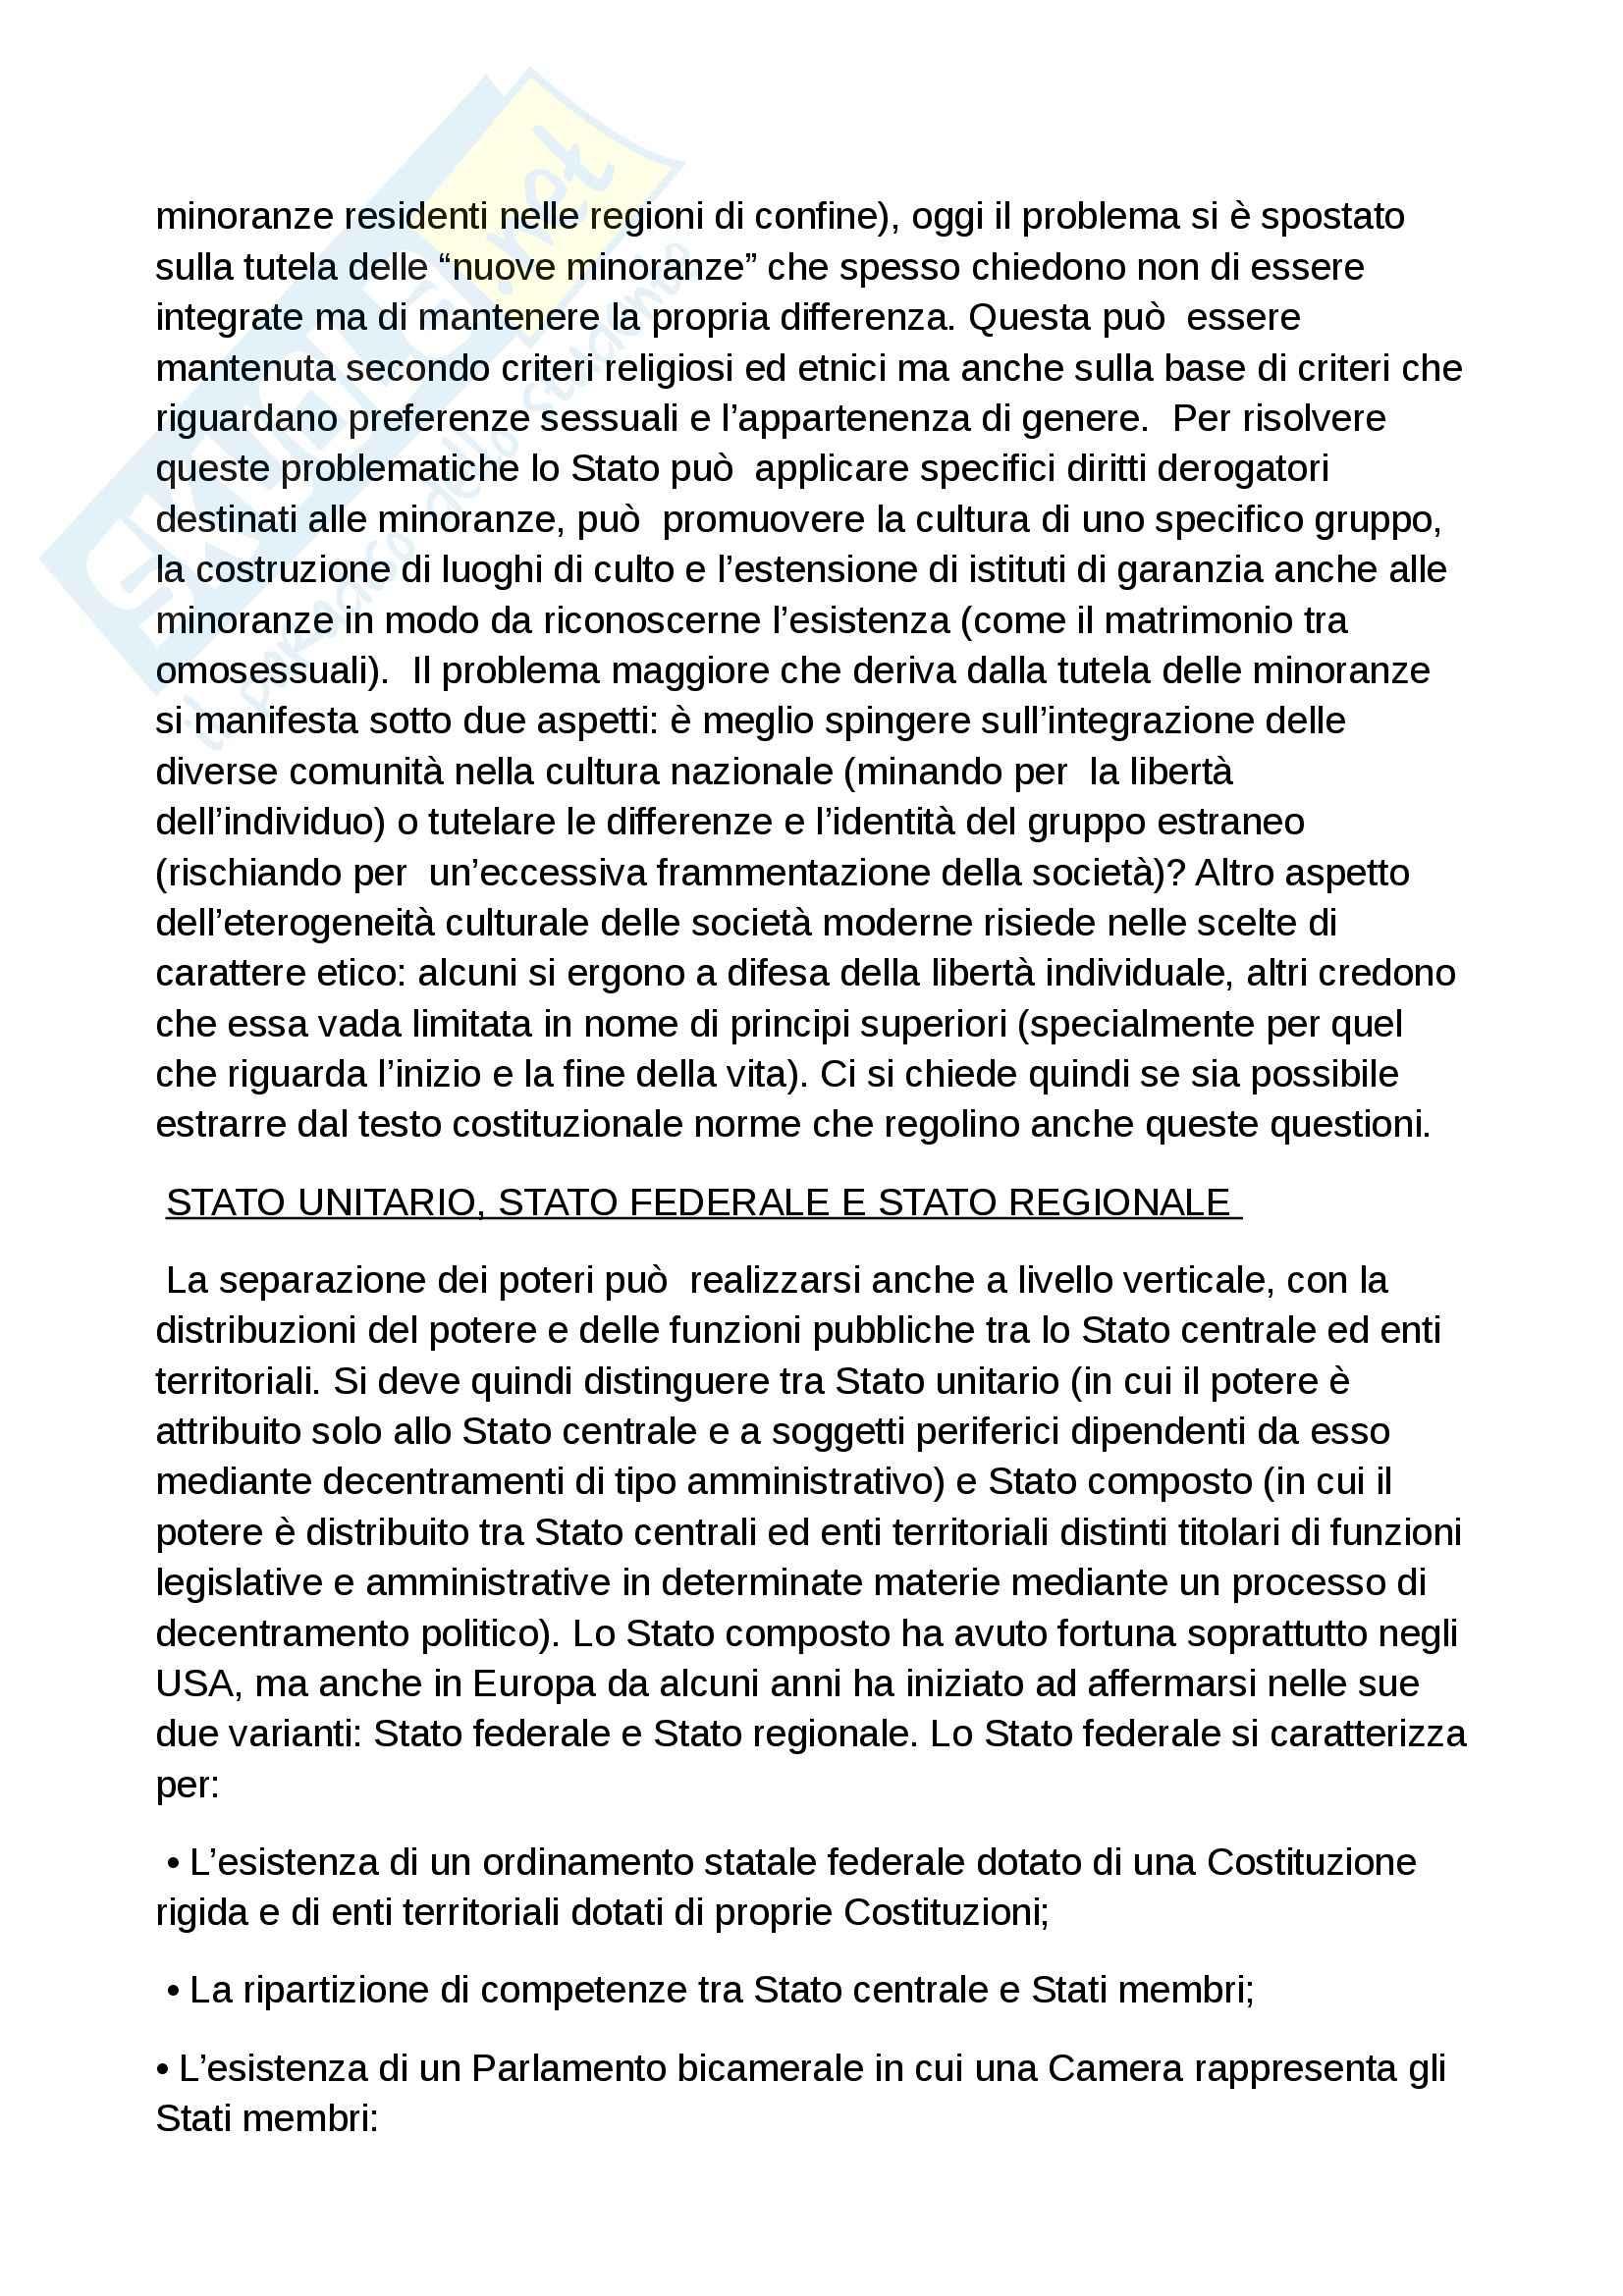 Riassunto esame diritto costituzionale, prof. Grosso, libro Diritto costituzionale, Bin, Pitruzzella Pag. 21